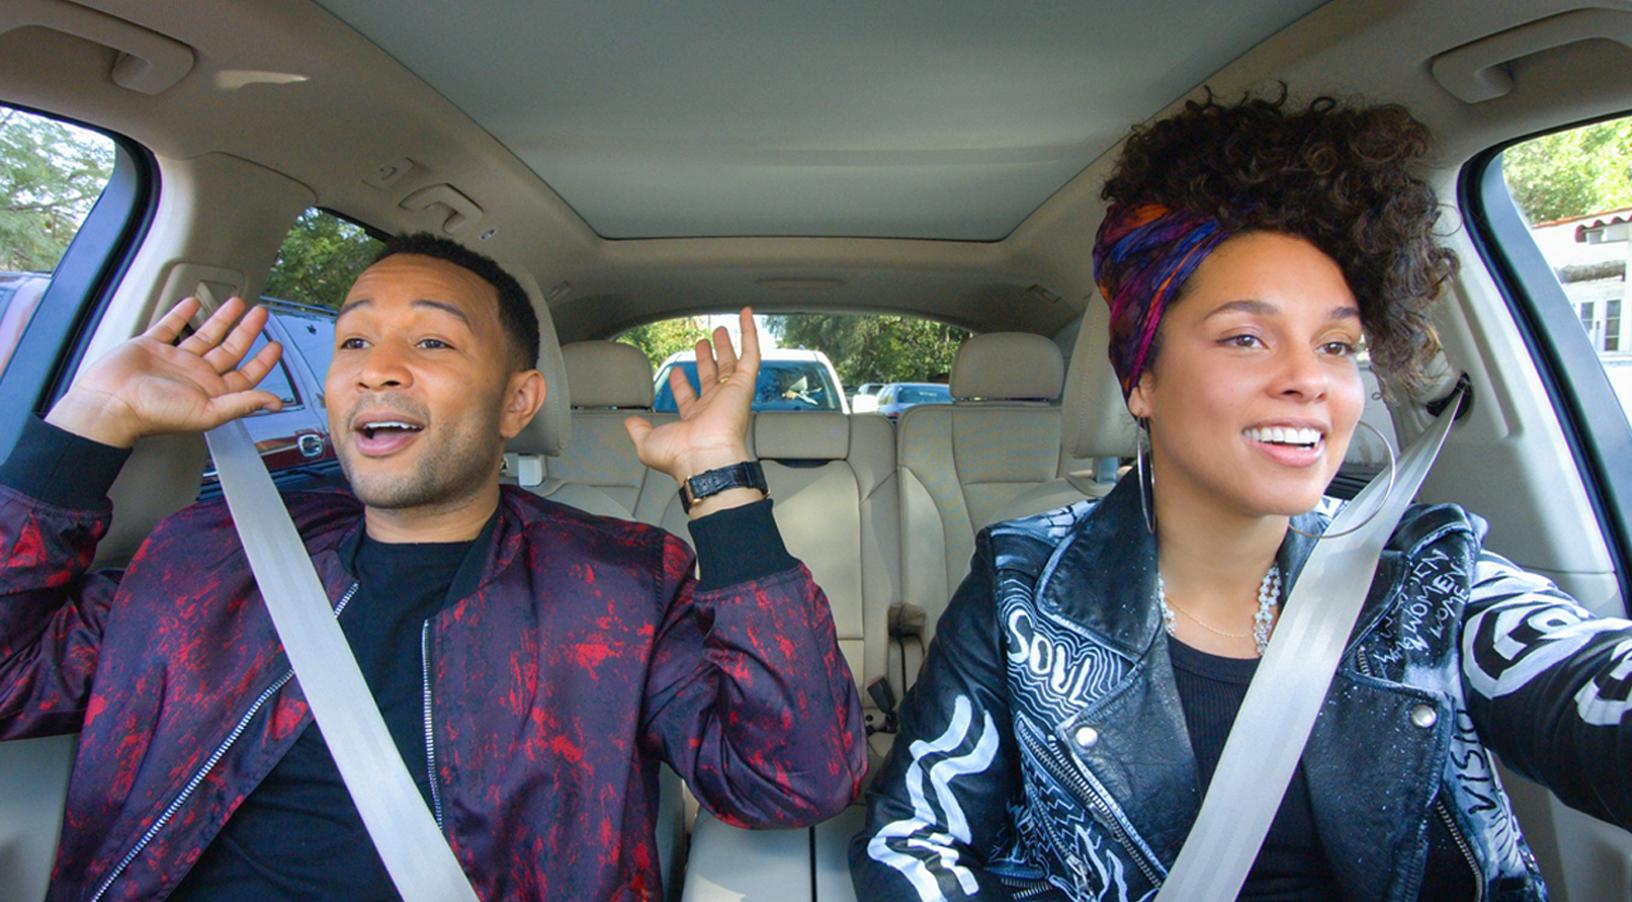 John Legend and Alicia Keys in a car on Carpool Karaoke